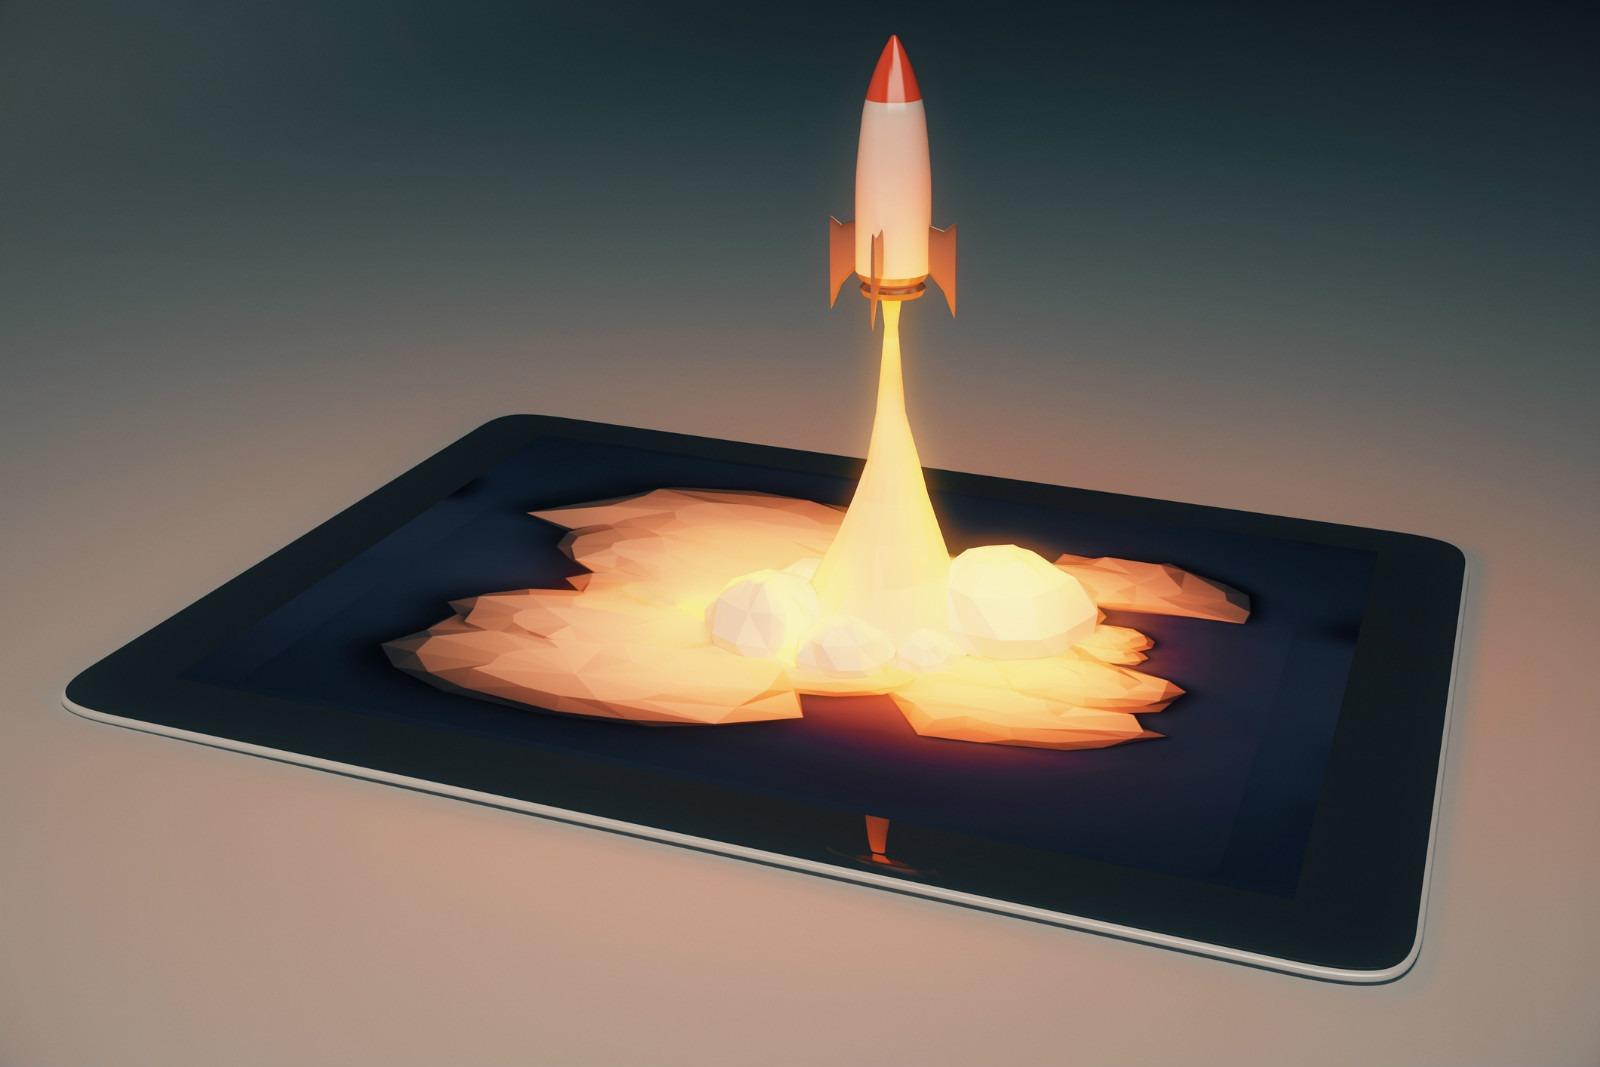 Mobile data set to skyrocket by 700% in 2021 - Columbus UK.